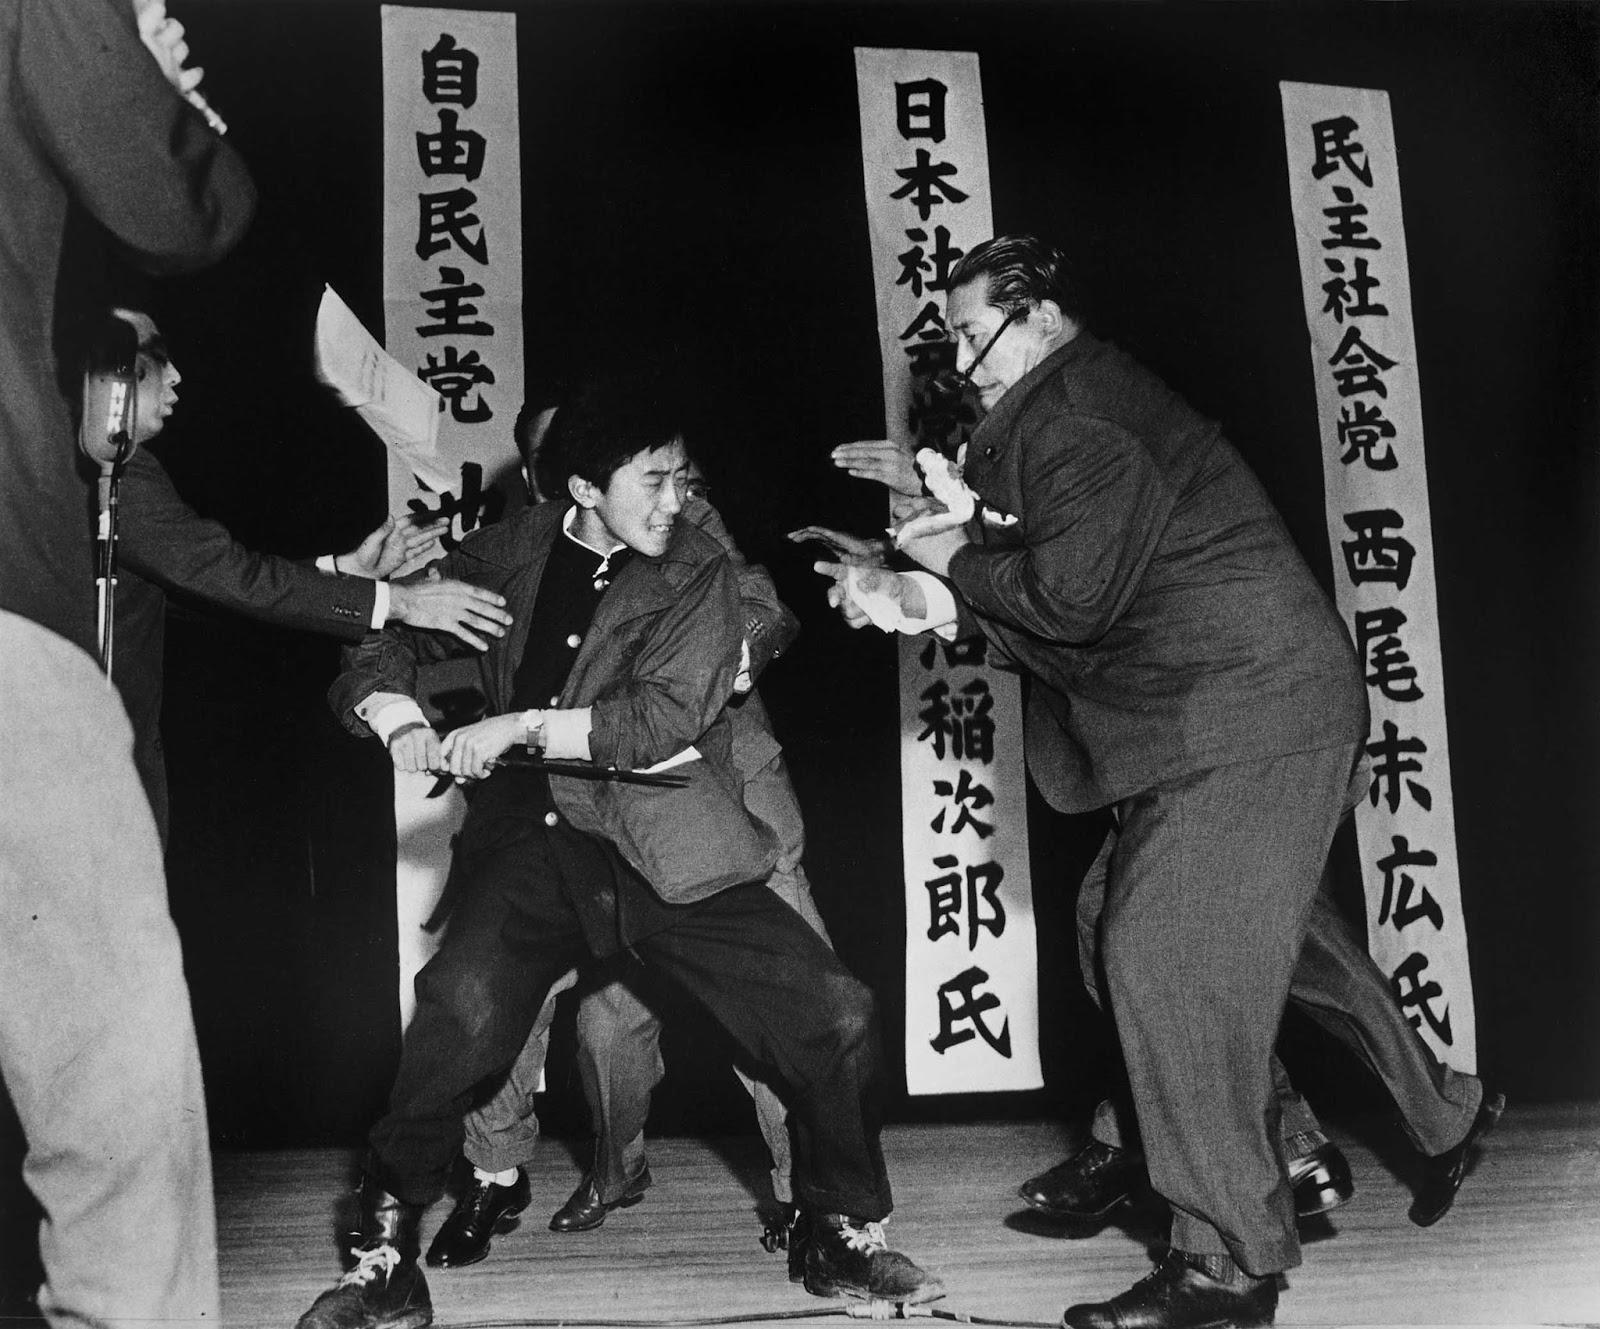 story behind the 'Tokyo Stabbing'